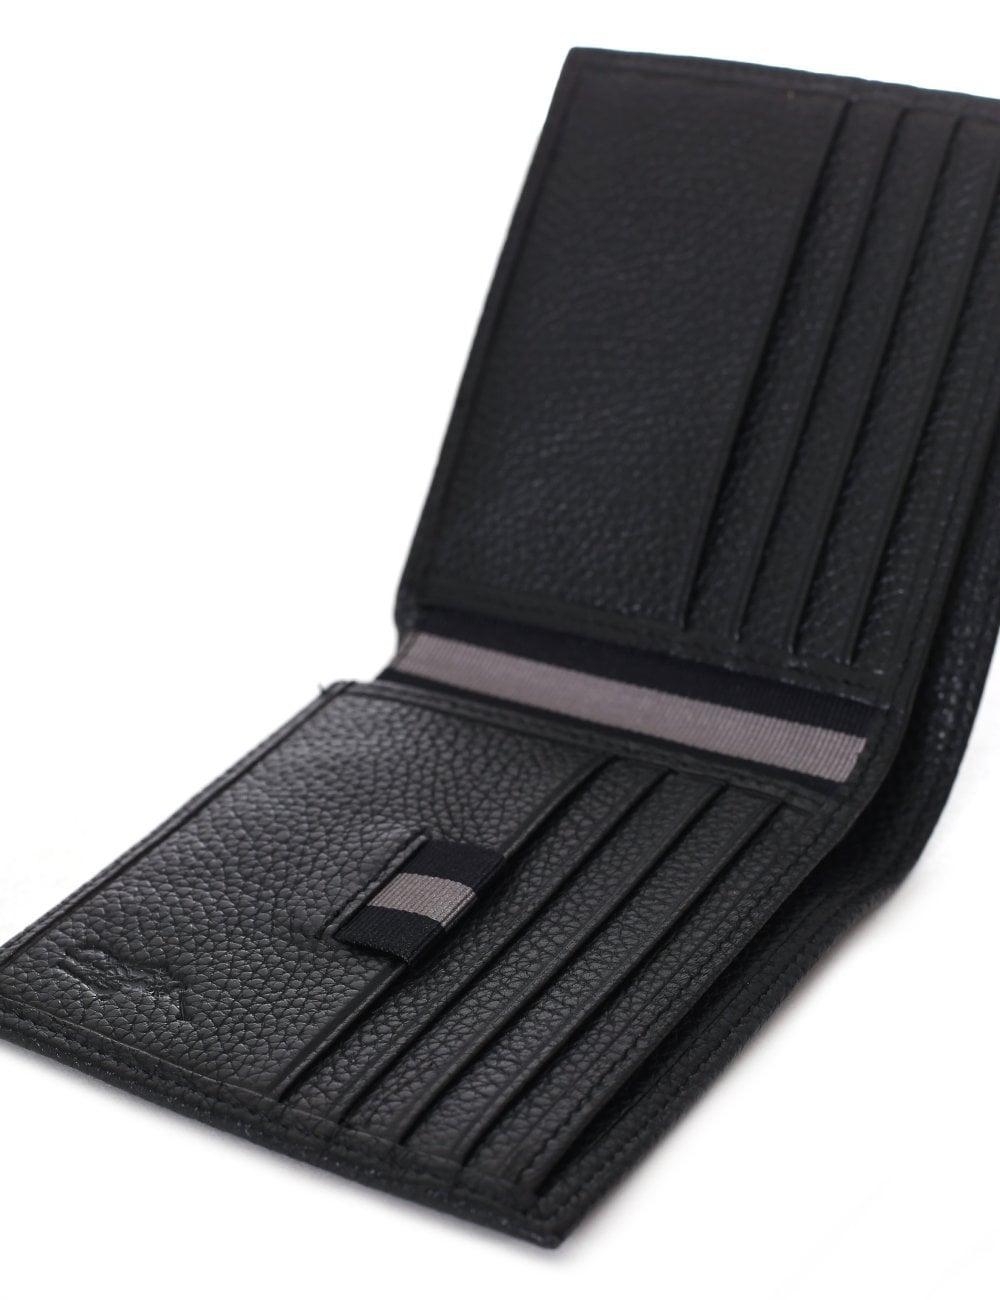 bd29eaccbde Polo Ralph Lauren Men's Billfold Wallet